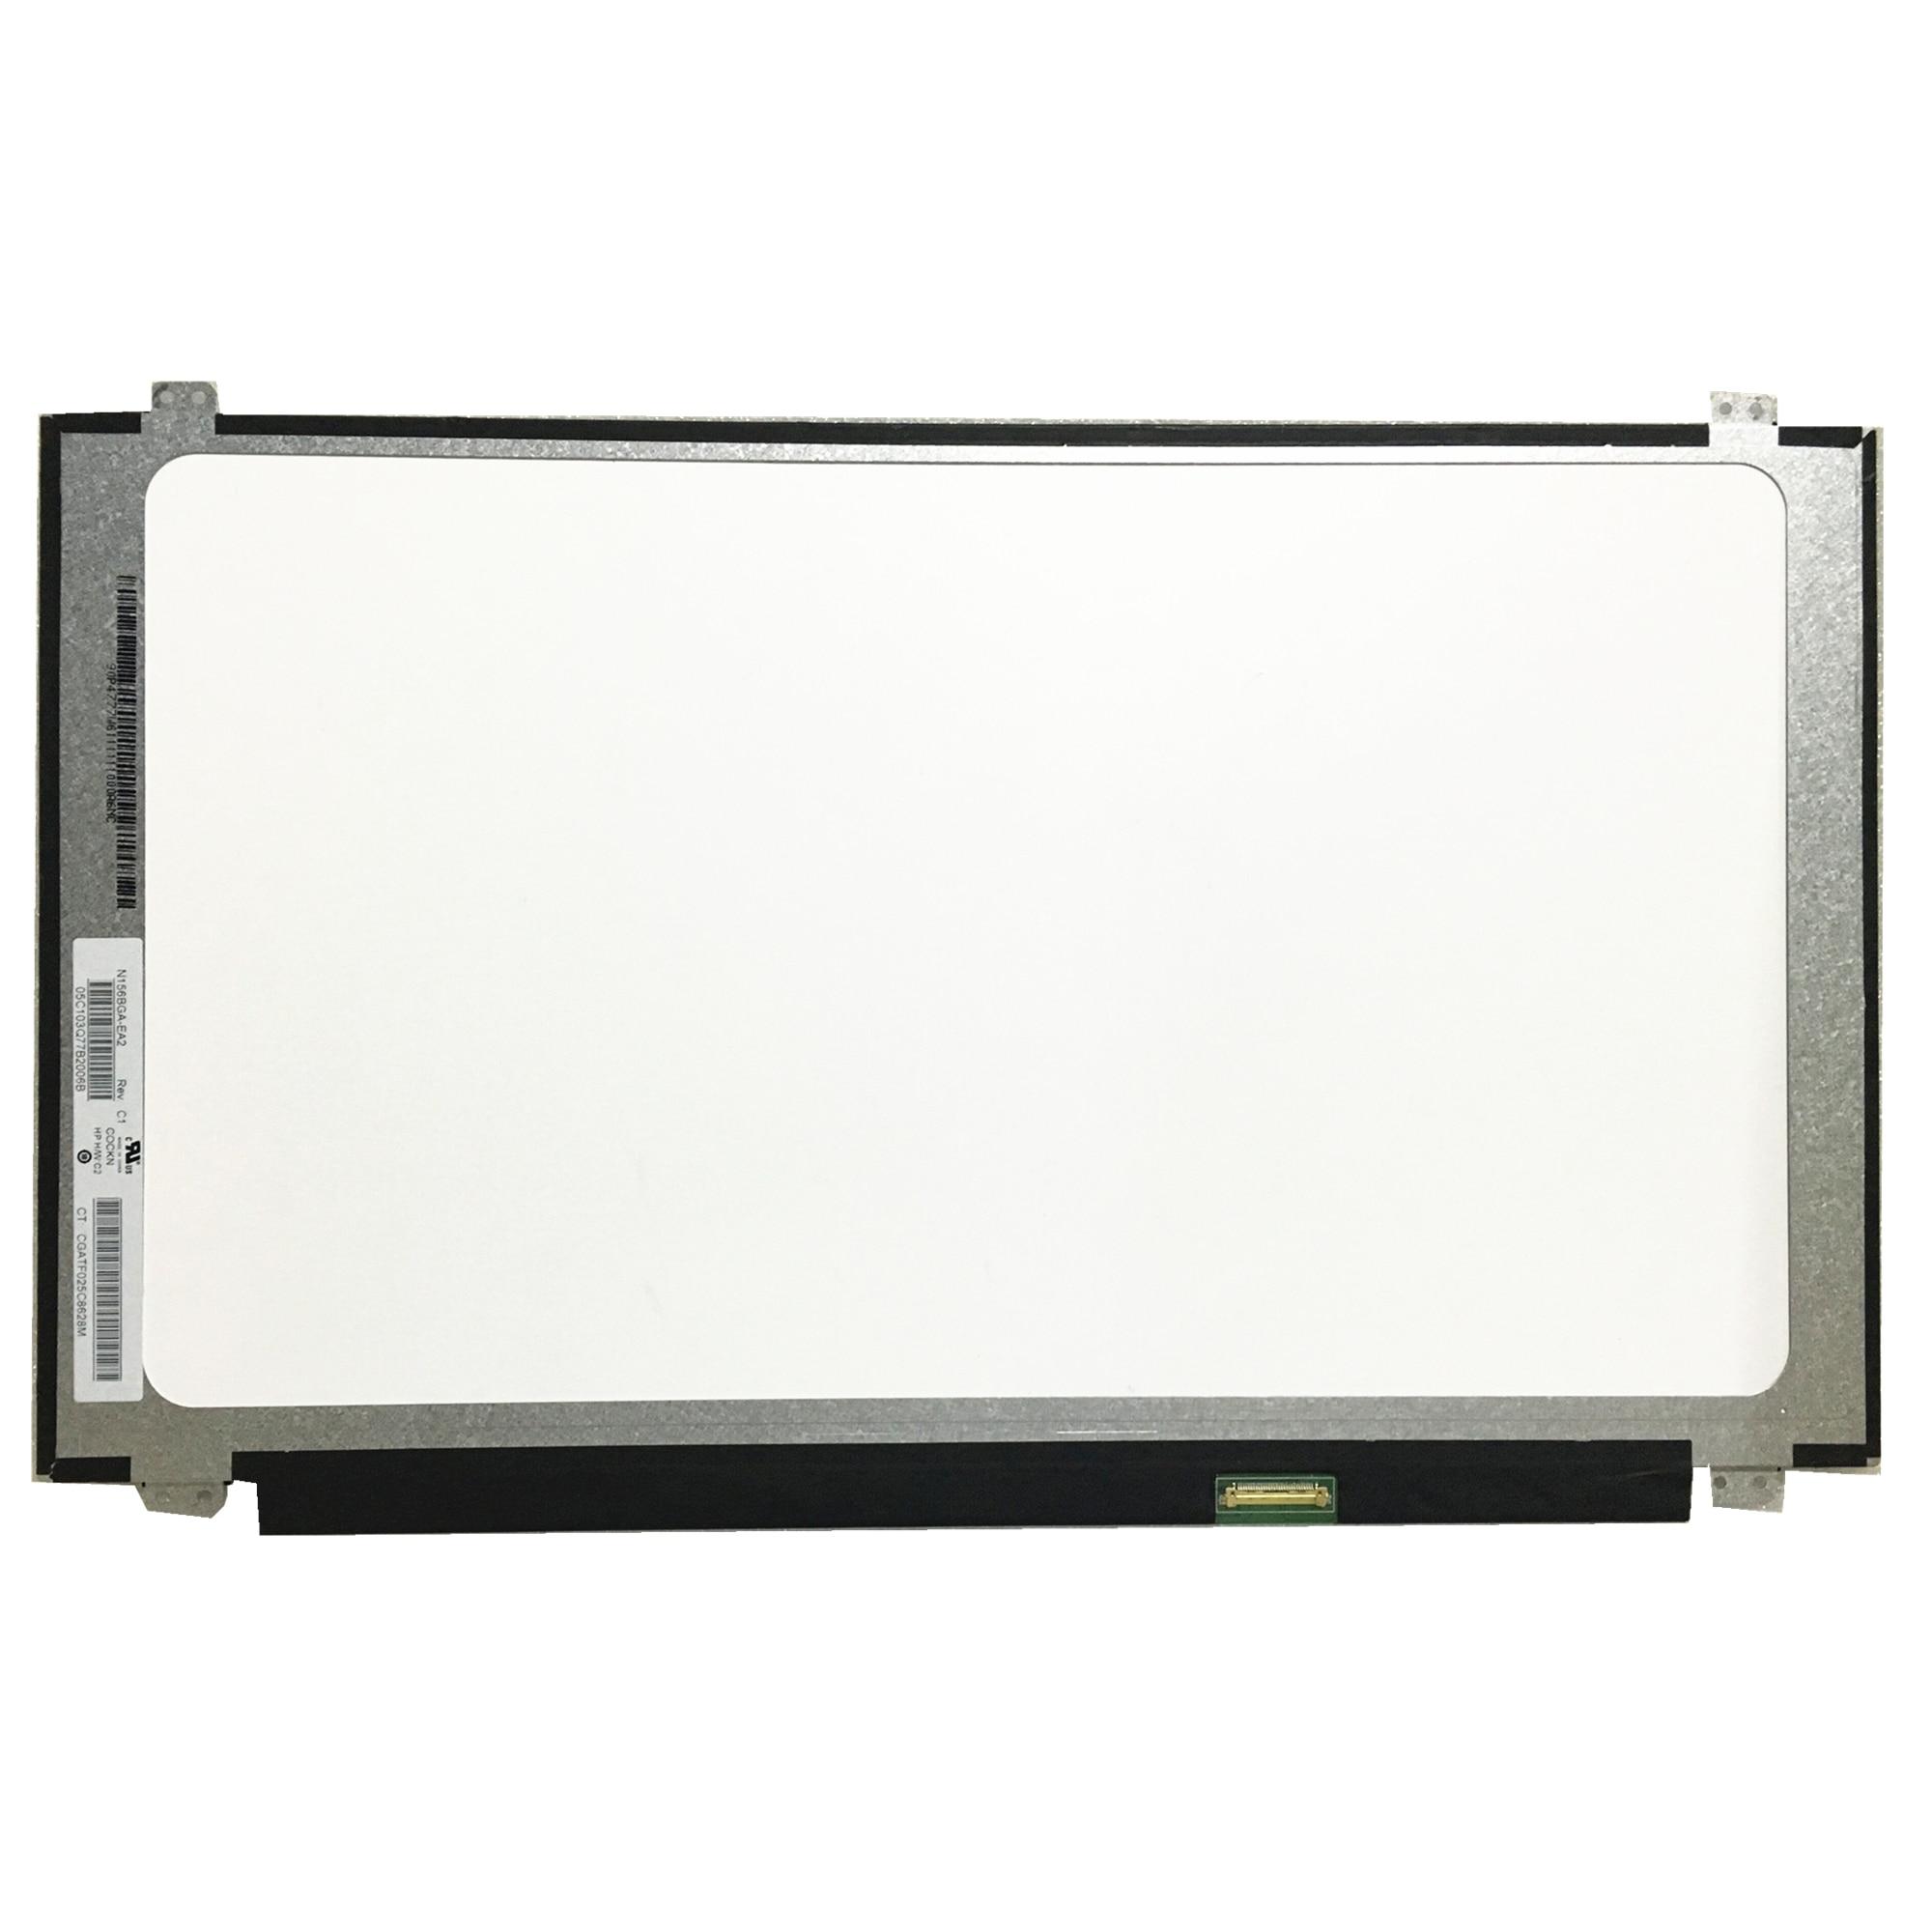 Free Shipping N156BGA-EA2 N156BGA EA2 N156BGA EB2 B156XTN07.0 B156XTN07.1 15.6 Slim Lcd Screen EDP 30 Pins